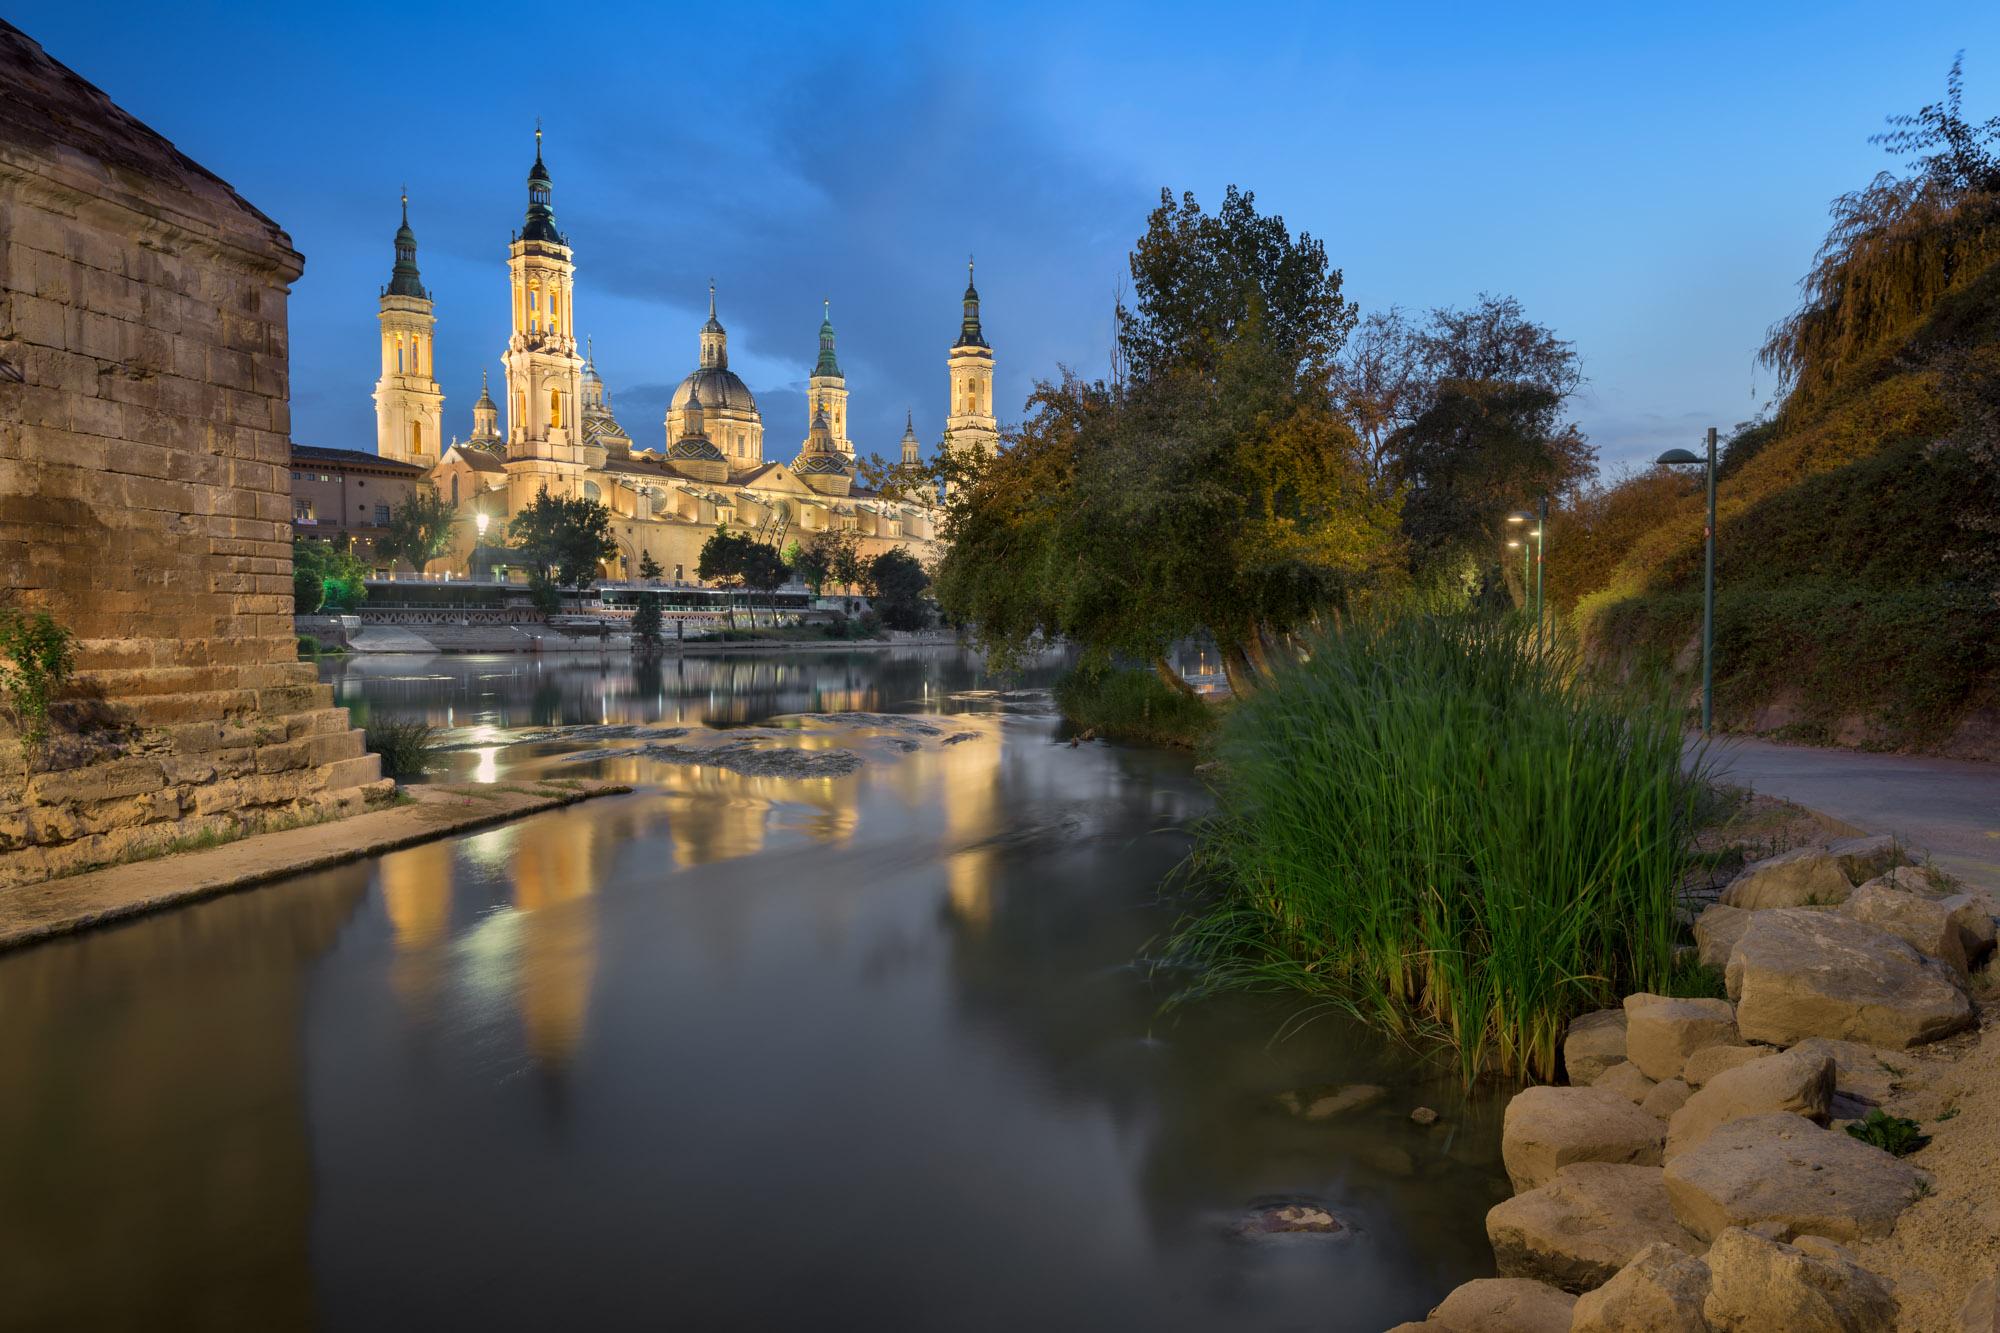 Basilica of Our Lady of the Pillar, Zaragoza, Spain